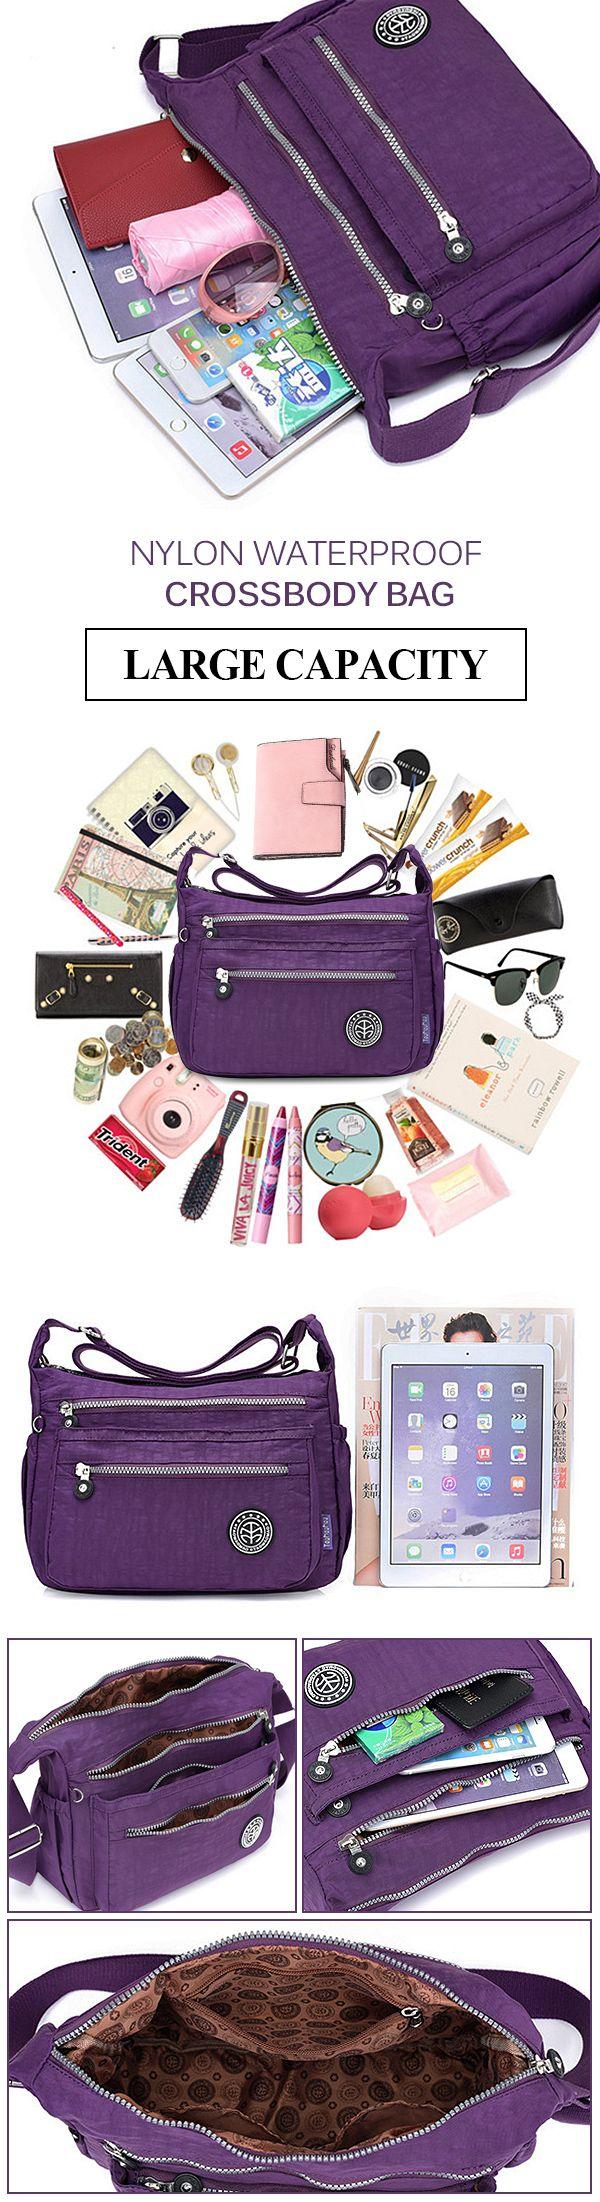 【$ 15.53】 Jinqiaoer Nylon Waterproof Lightweight Crossbody Bag Shoulder Bag Portable Travel Bag For Women